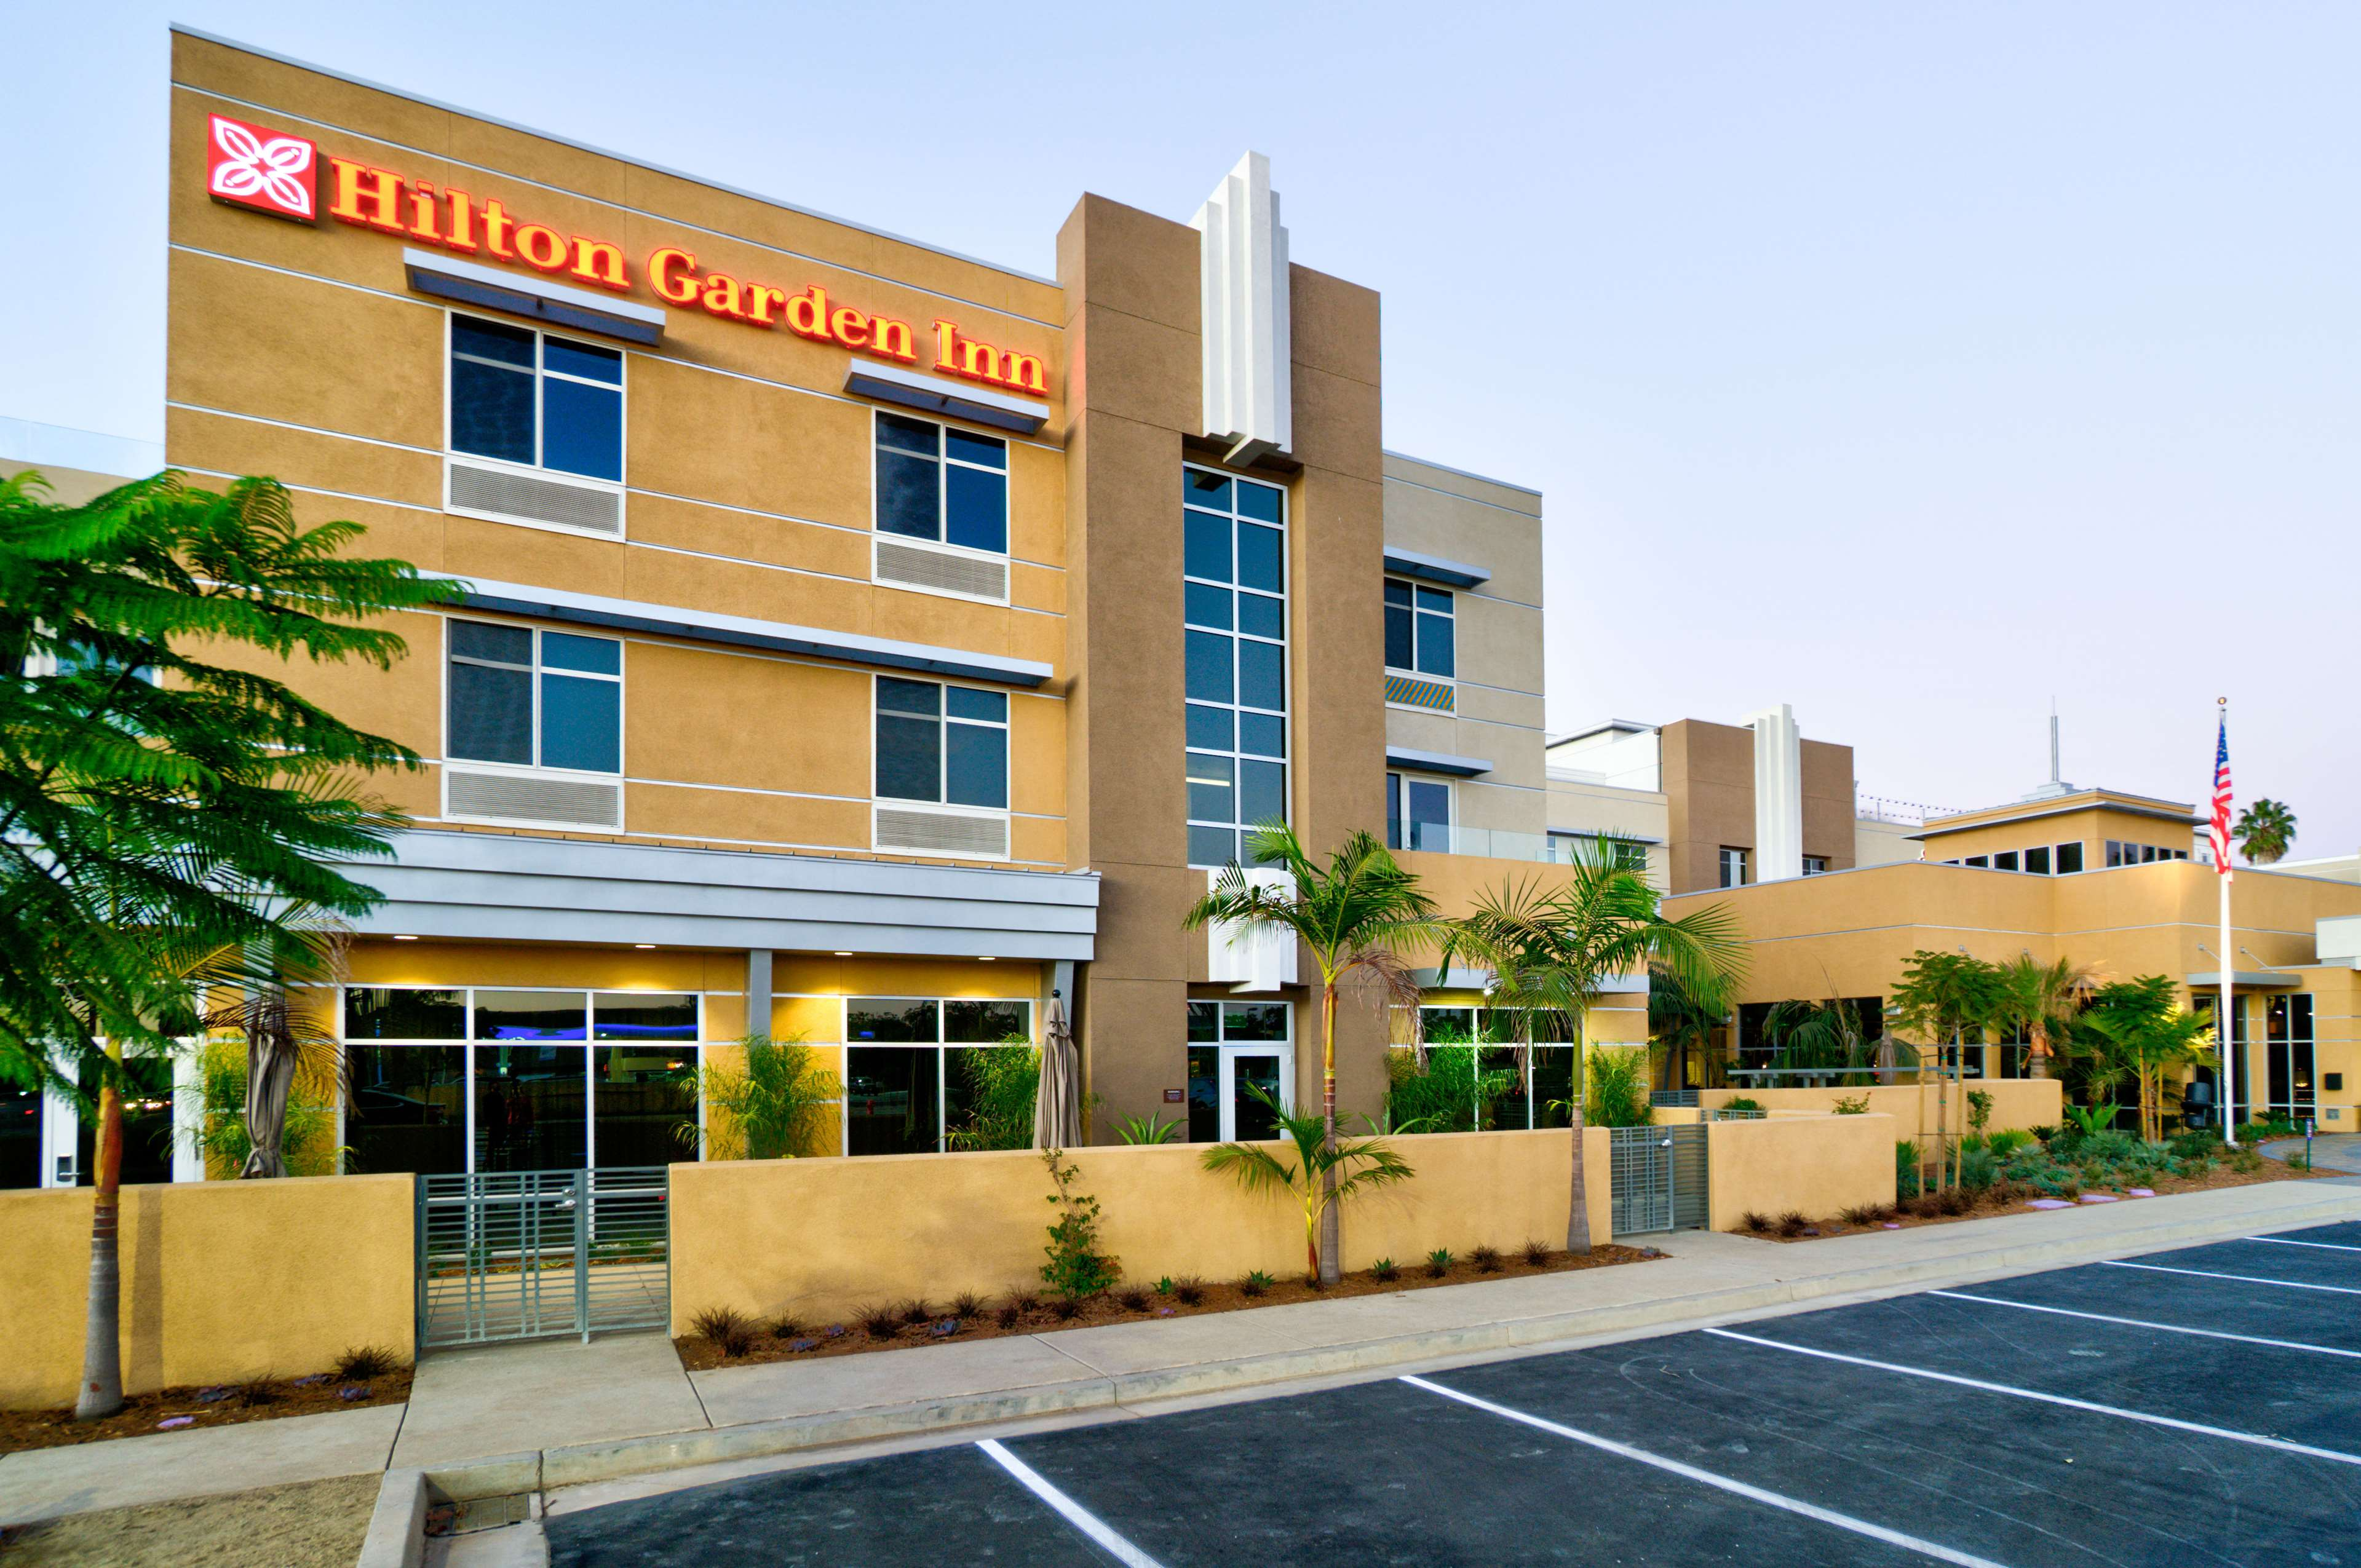 Hilton Garden Inn Santa Barbara/Goleta image 6